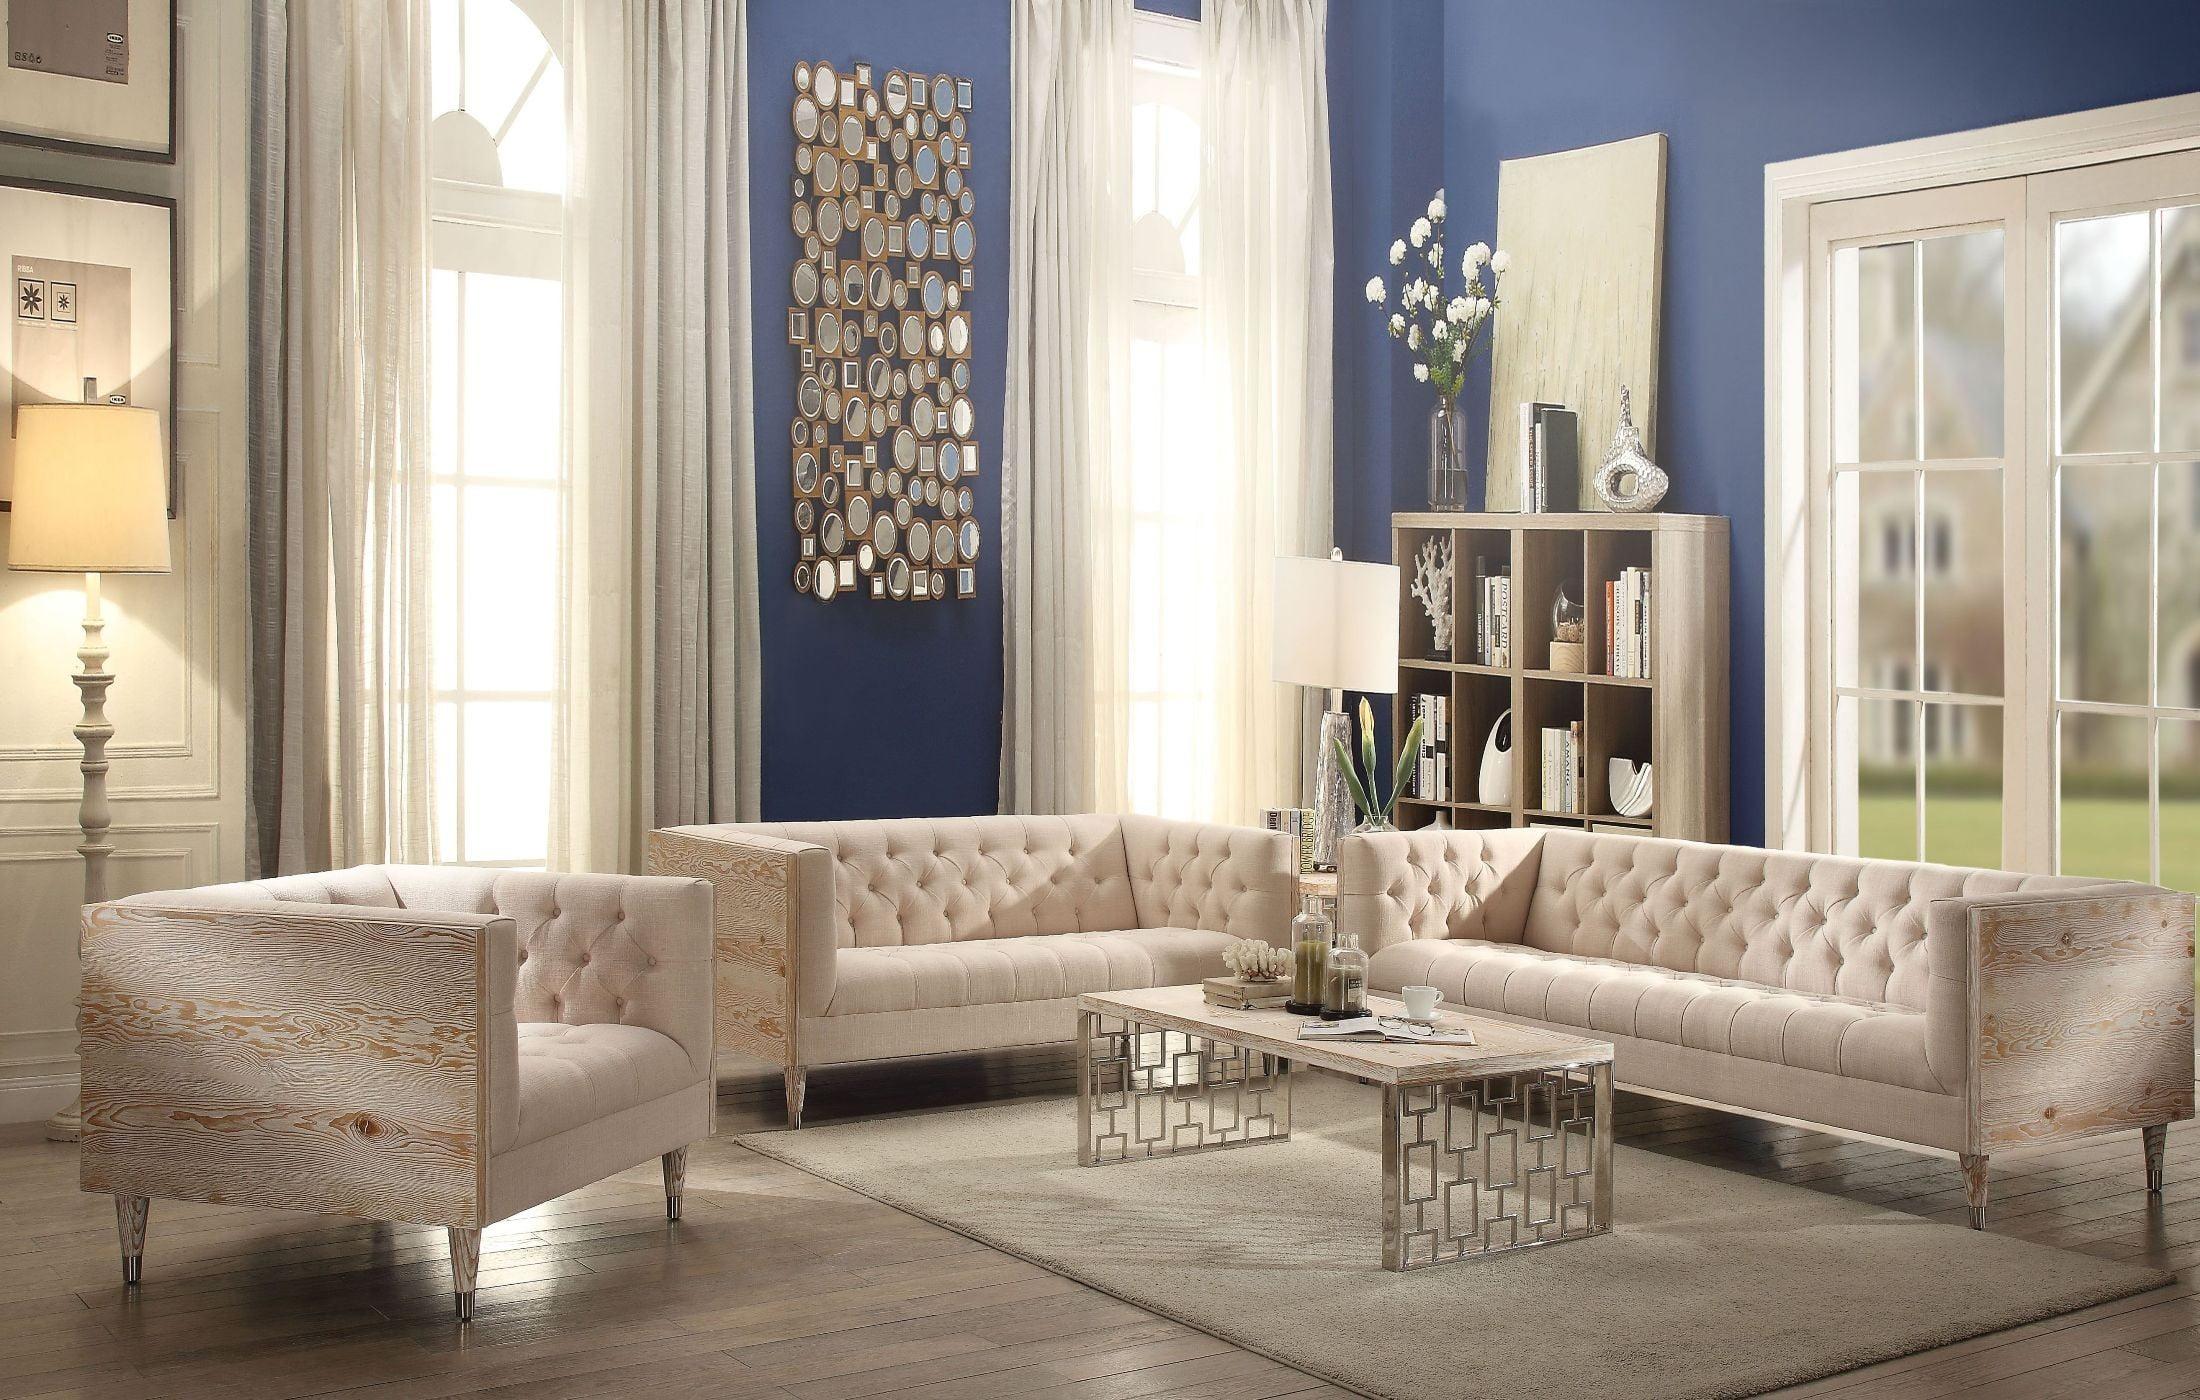 beige pillow coleman ryler ashley furniture living set room from htm livings